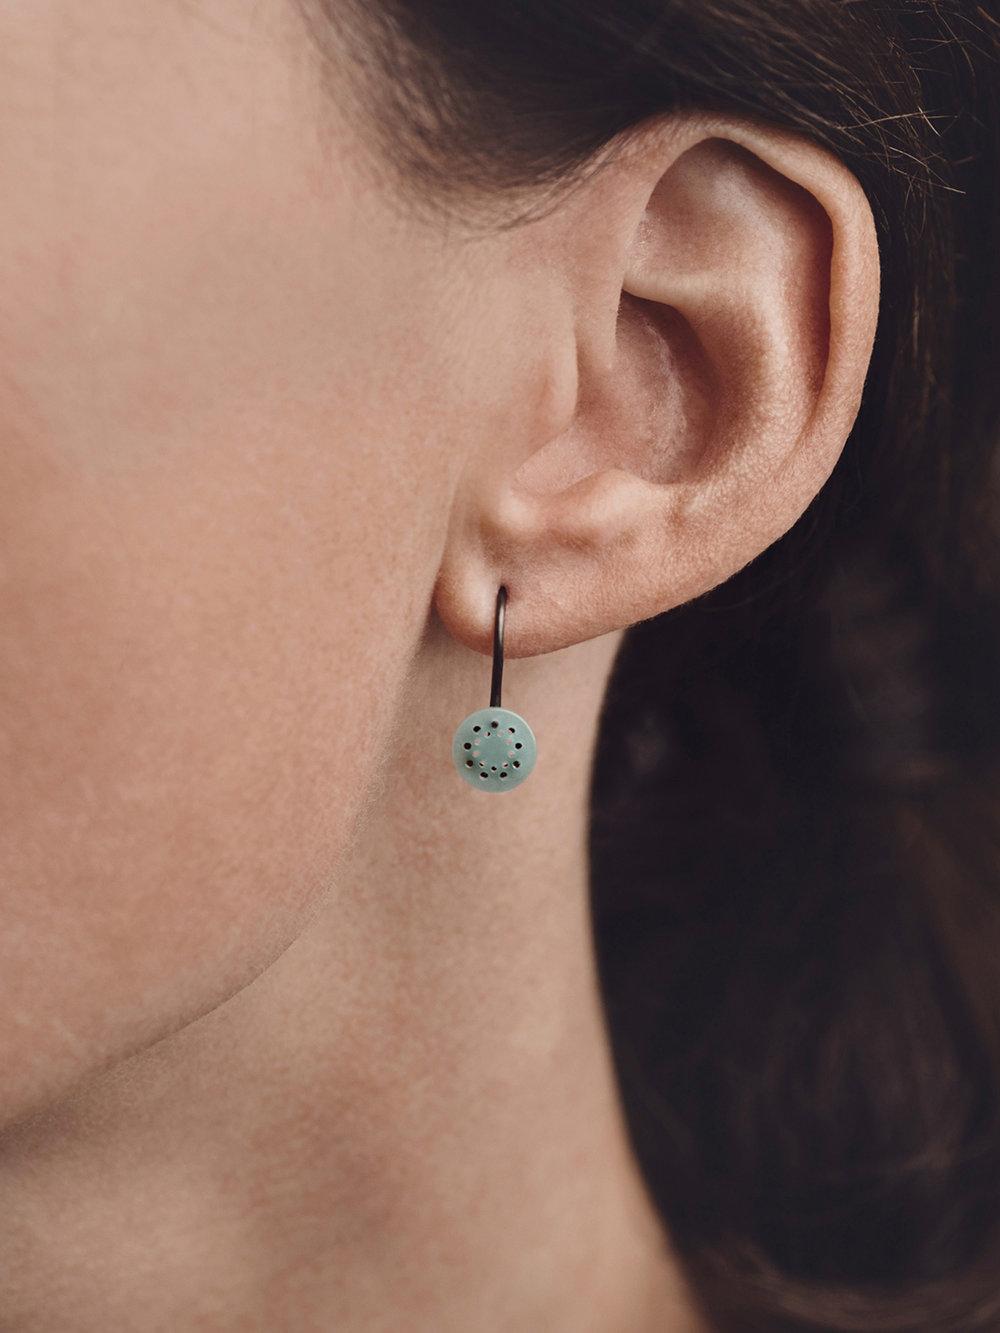 Christina Pauls, kleine Punkt-Ohrringe in Silber